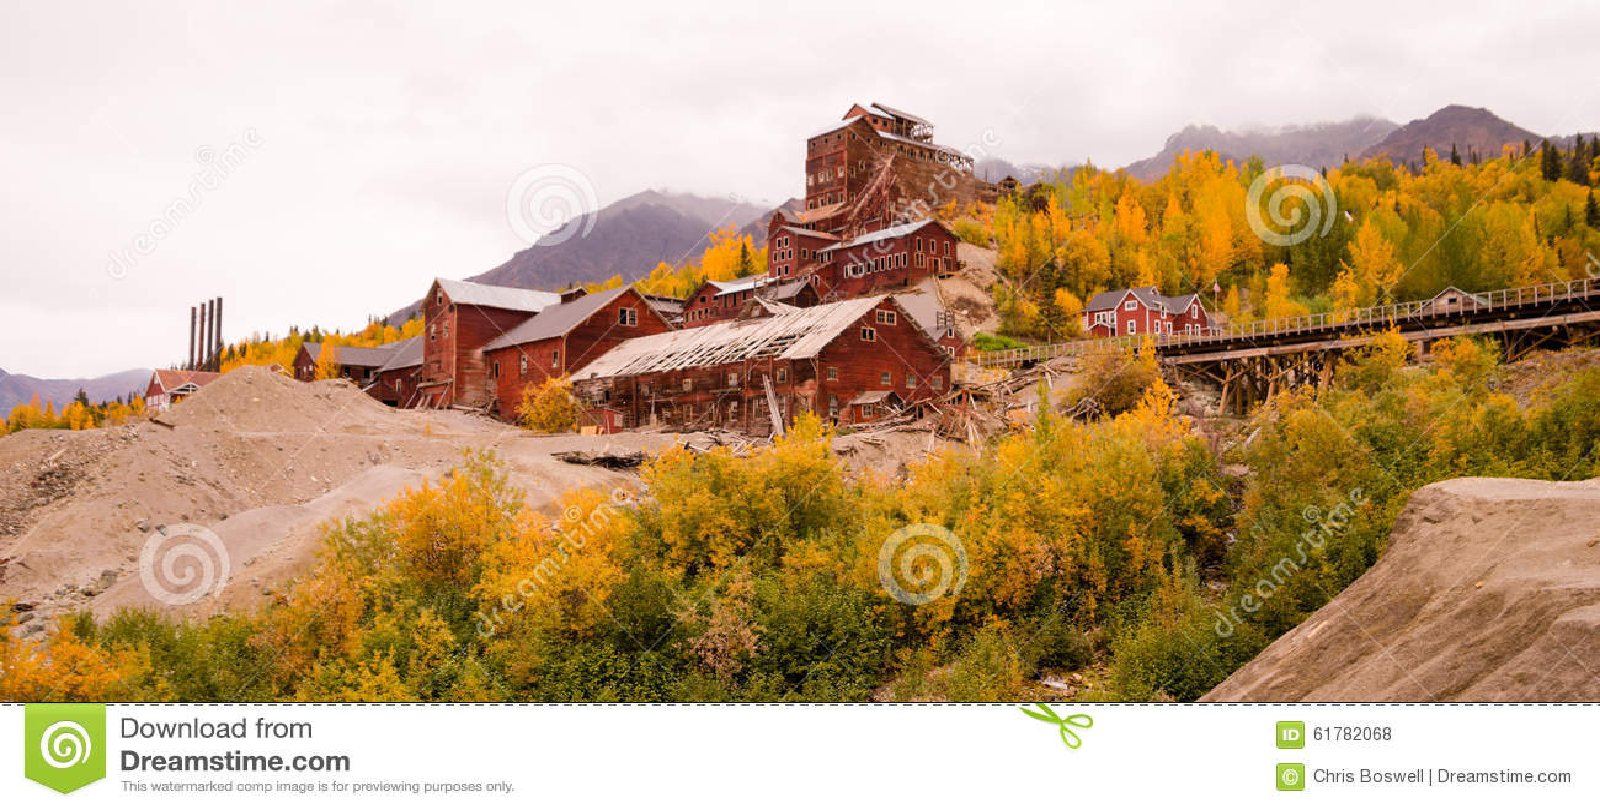 Wrangellst Elias Kennecott Mines Concentration Mill Alaska Wildernis